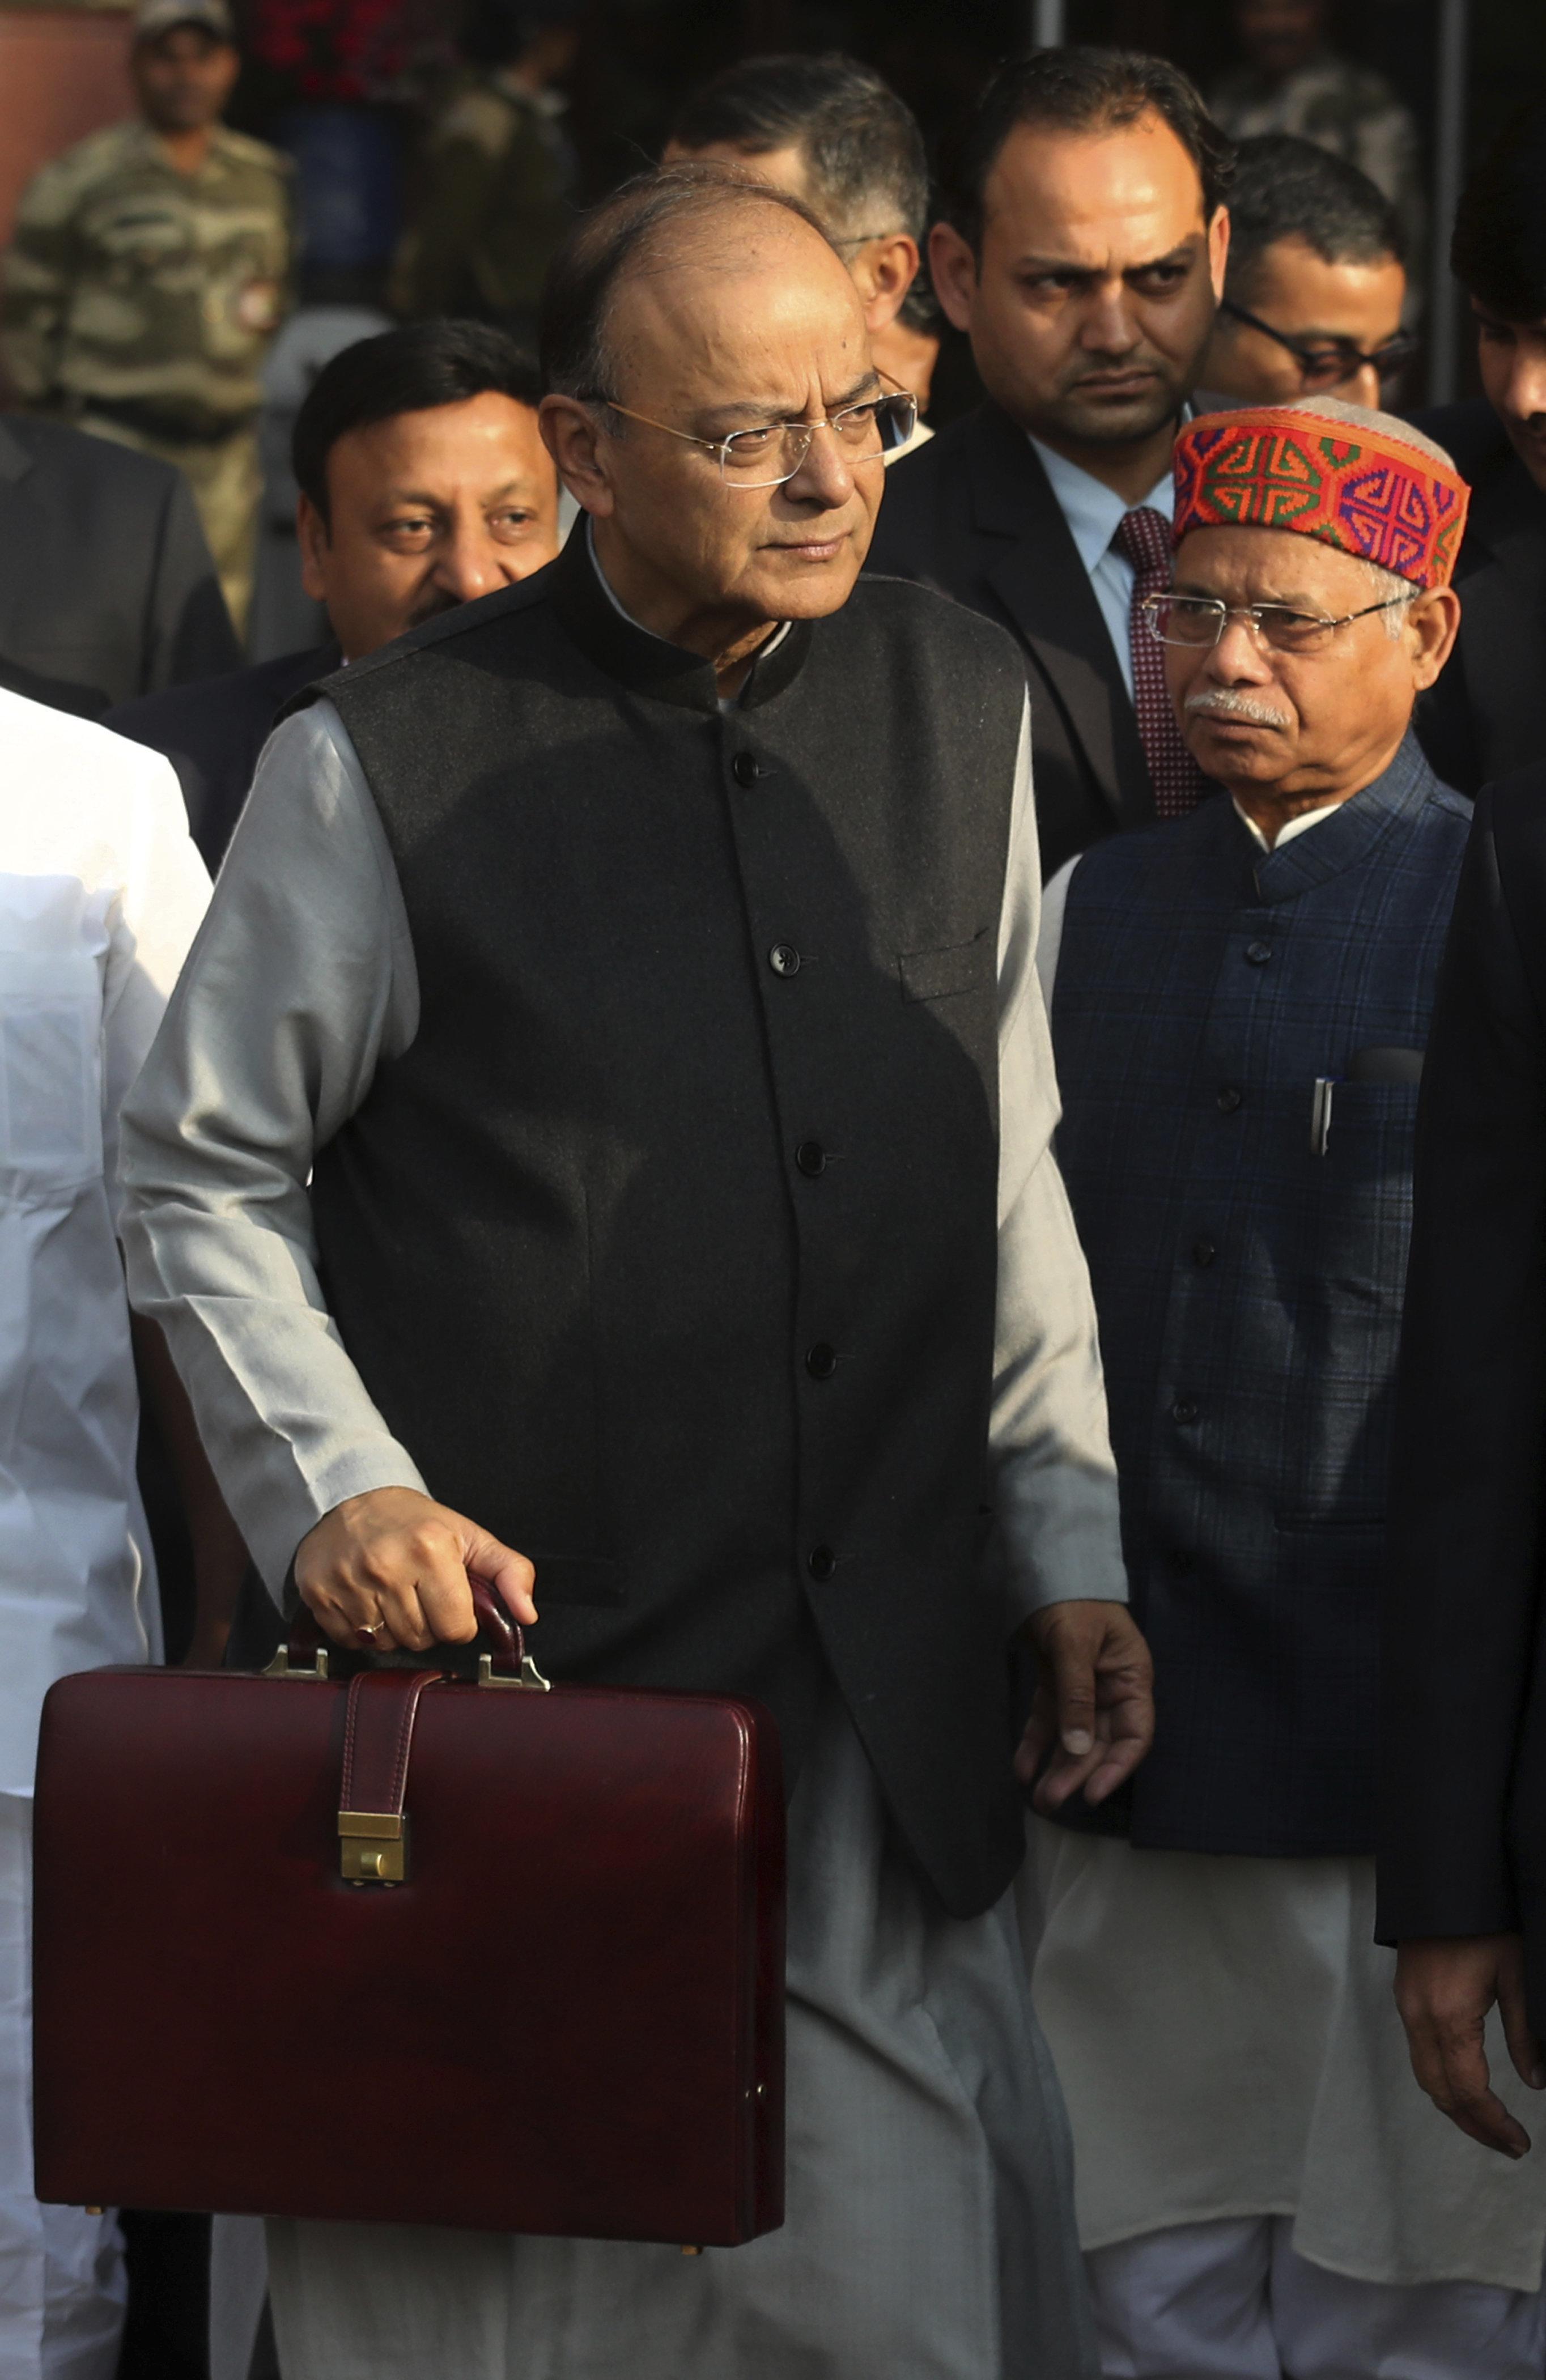 With Arun Jaitley Away For Treatment, Piyush Goyal May Present Budget